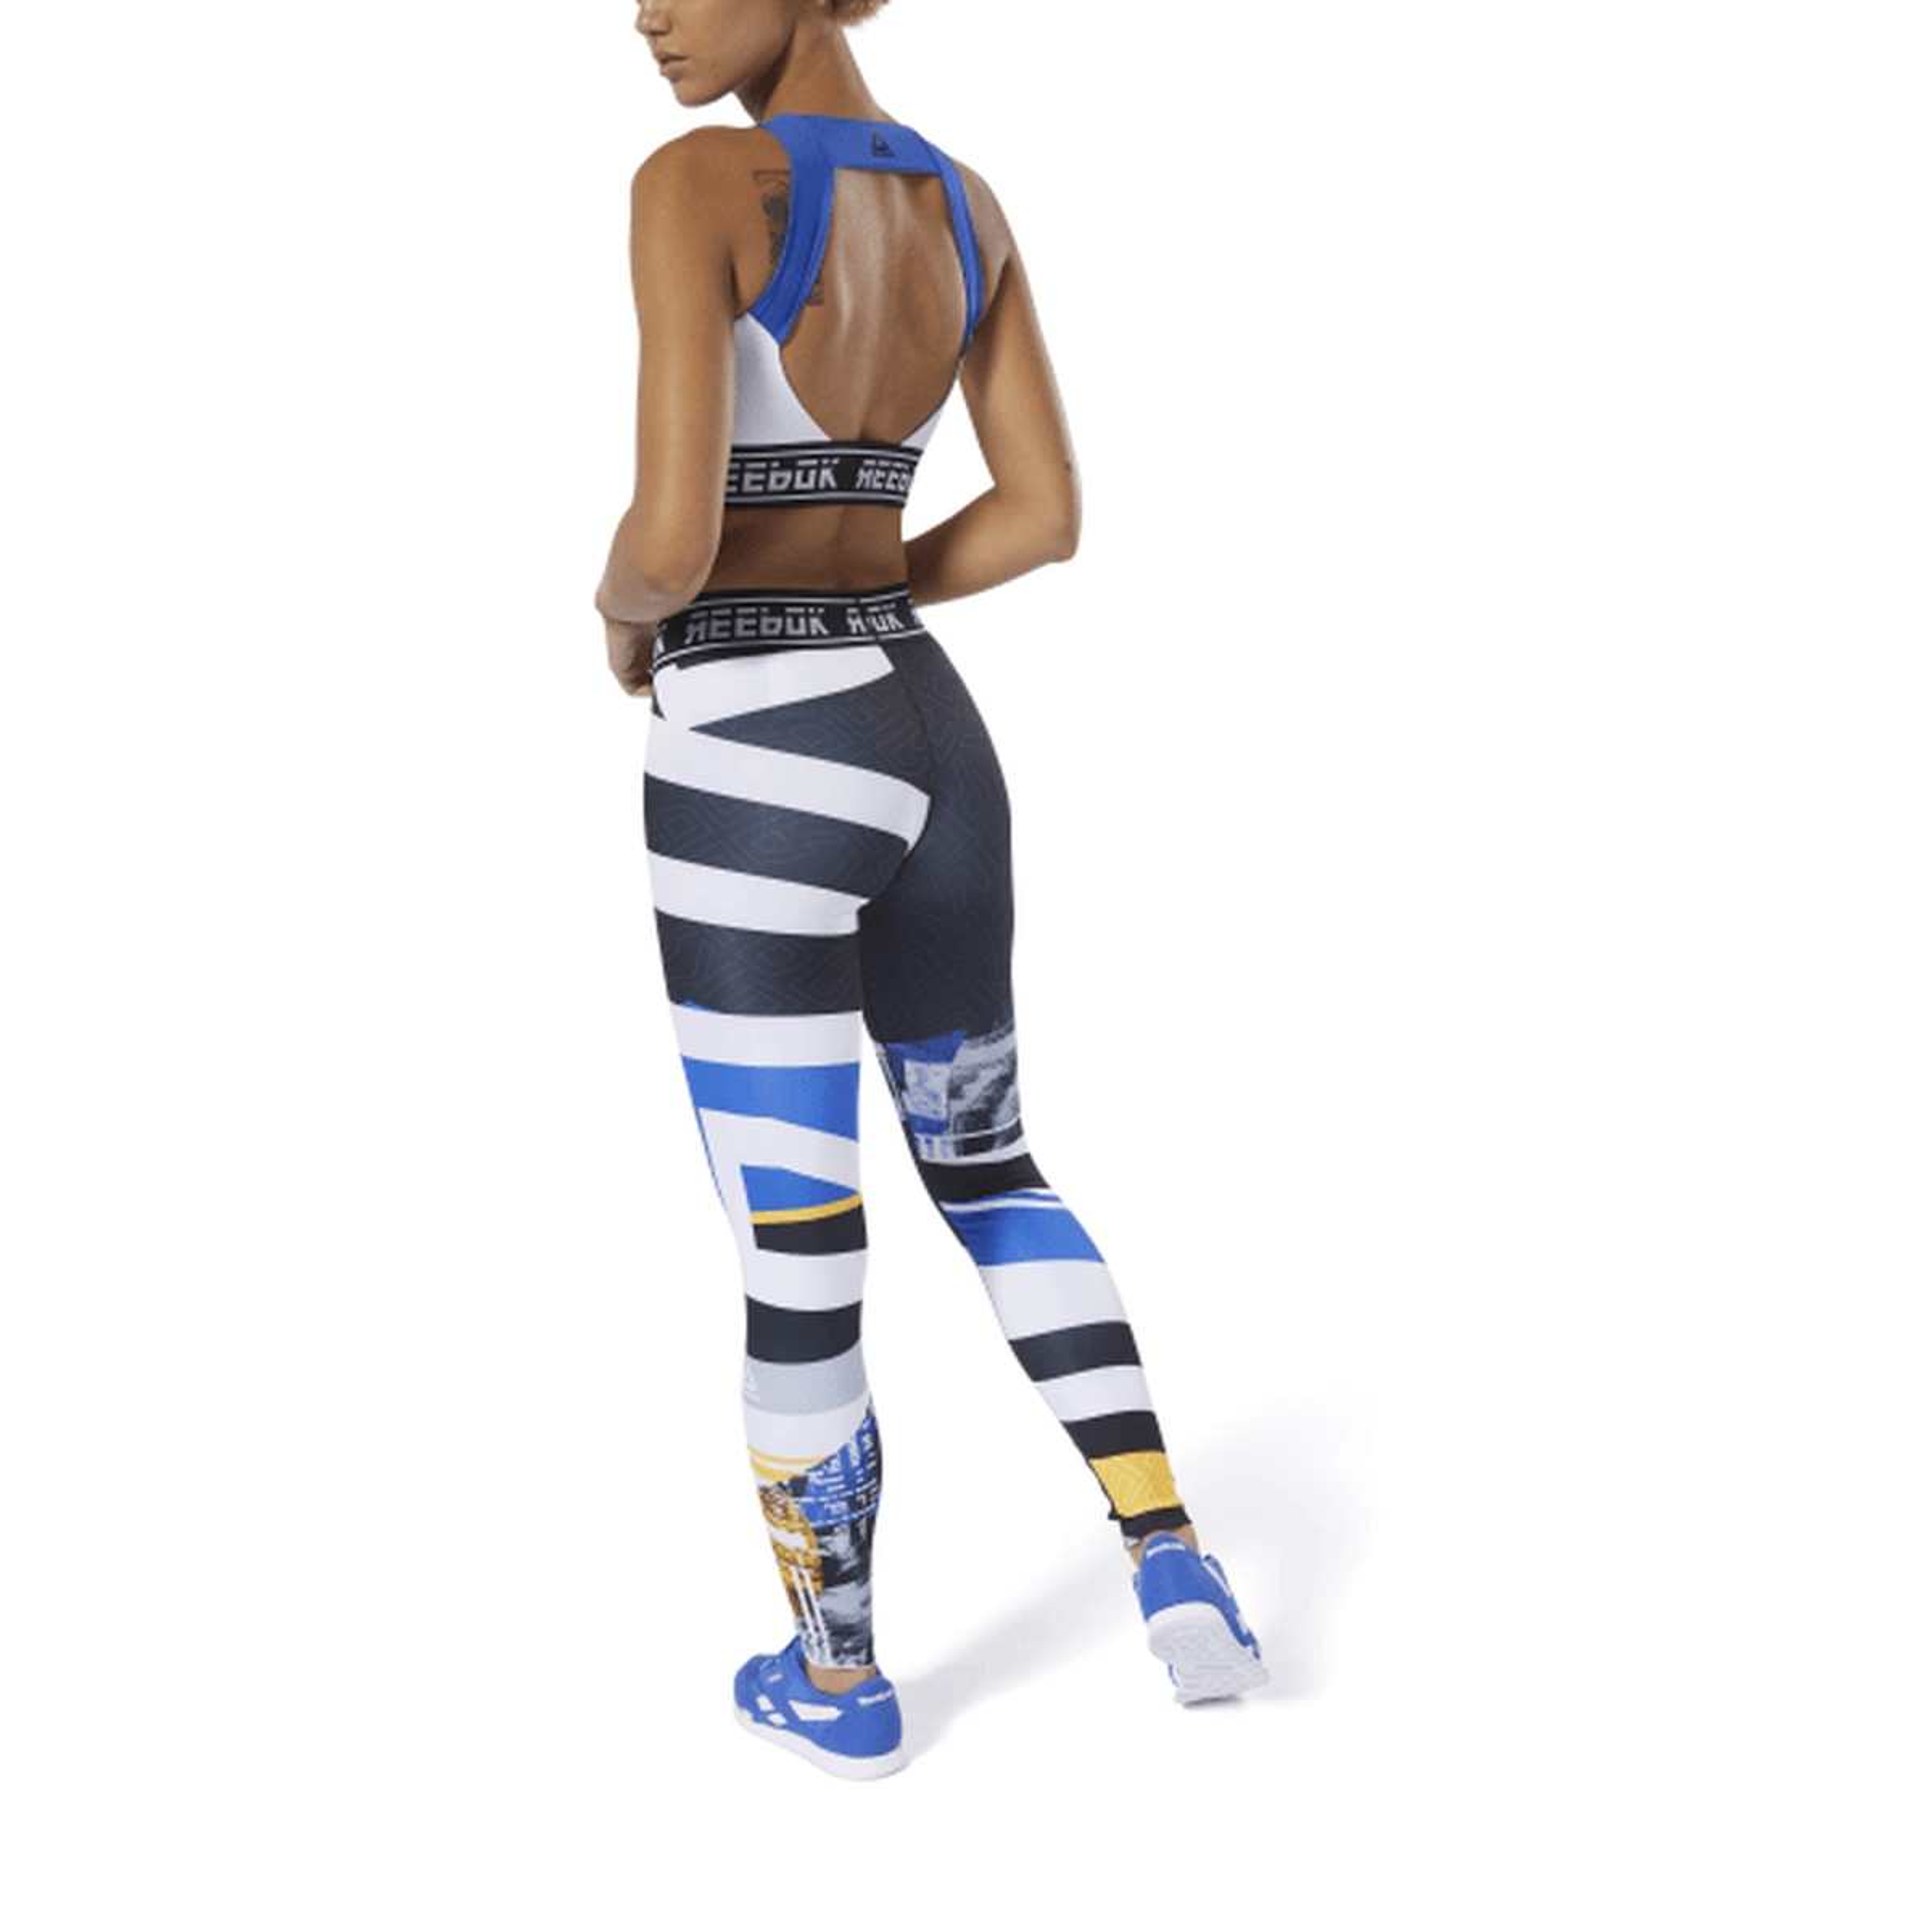 6e305bcf5de Reebok Work Out Engineered Tight - Fitness broeken - Fitnesskleding ...